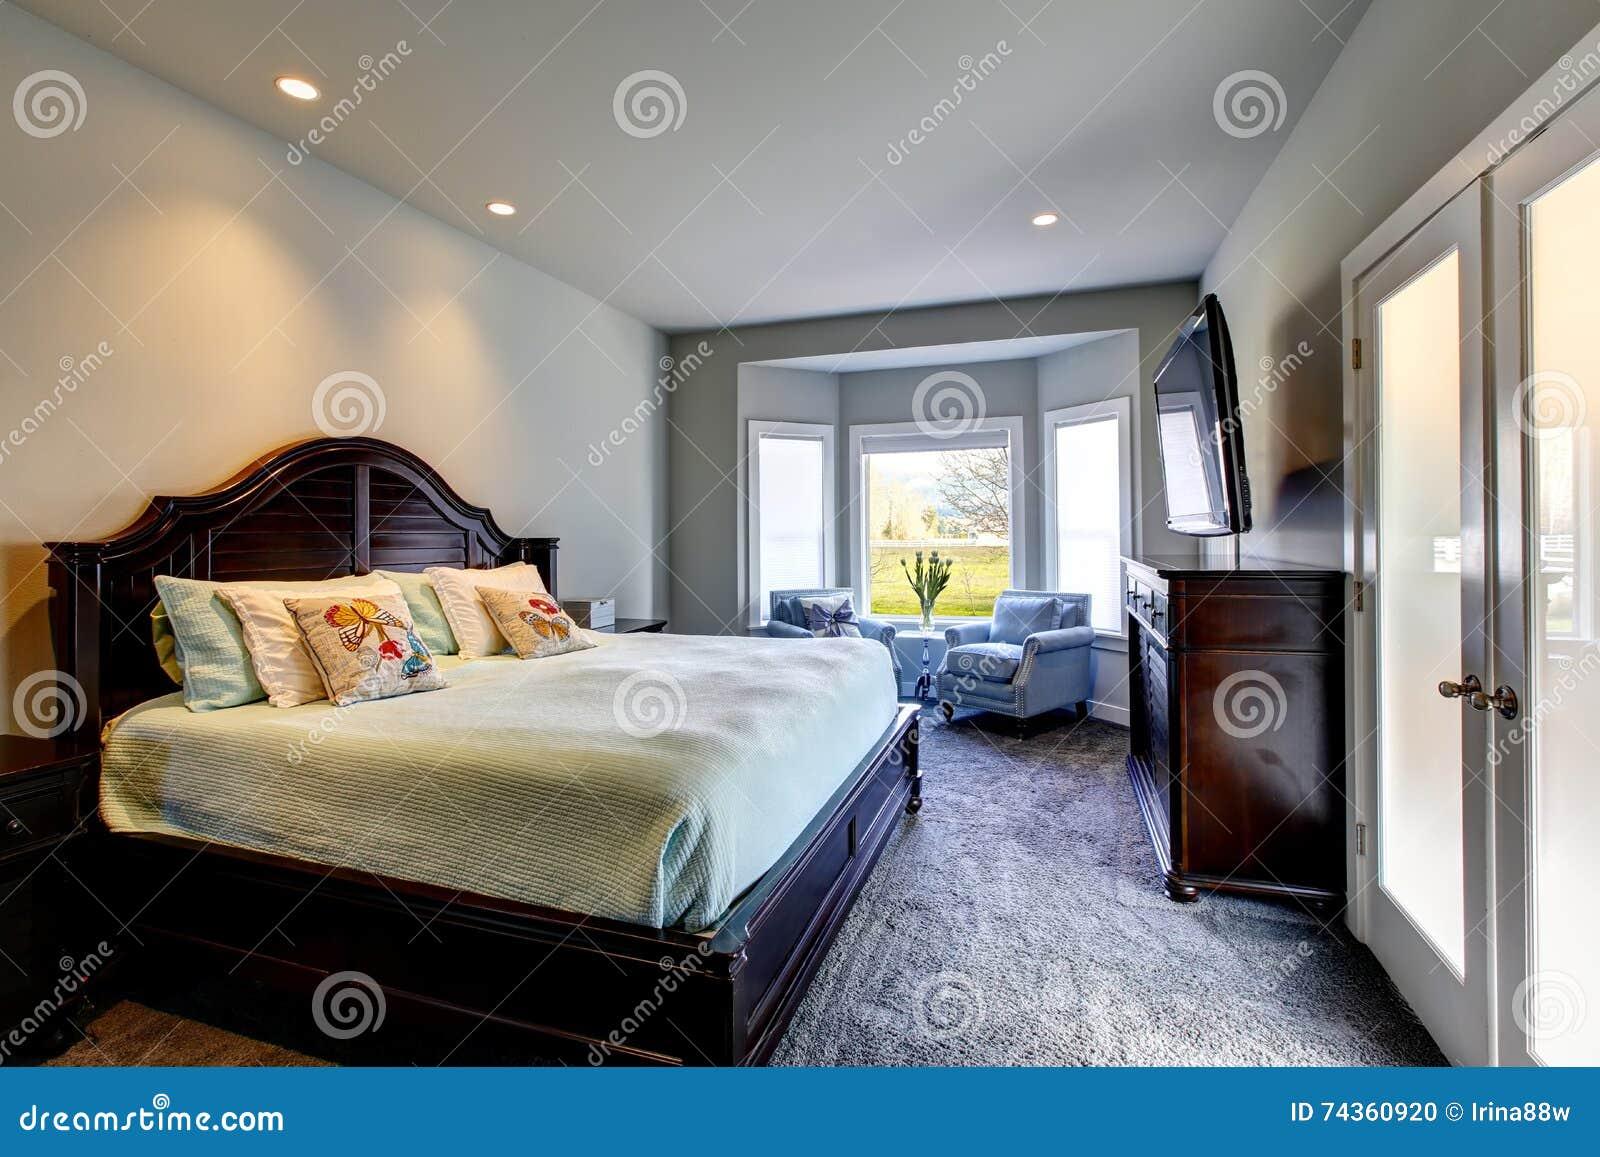 https://thumbs.dreamstime.com/z/klassieke-amerikaanse-slaapkamer-met-groene-muren-en-zwart-meubilair-74360920.jpg